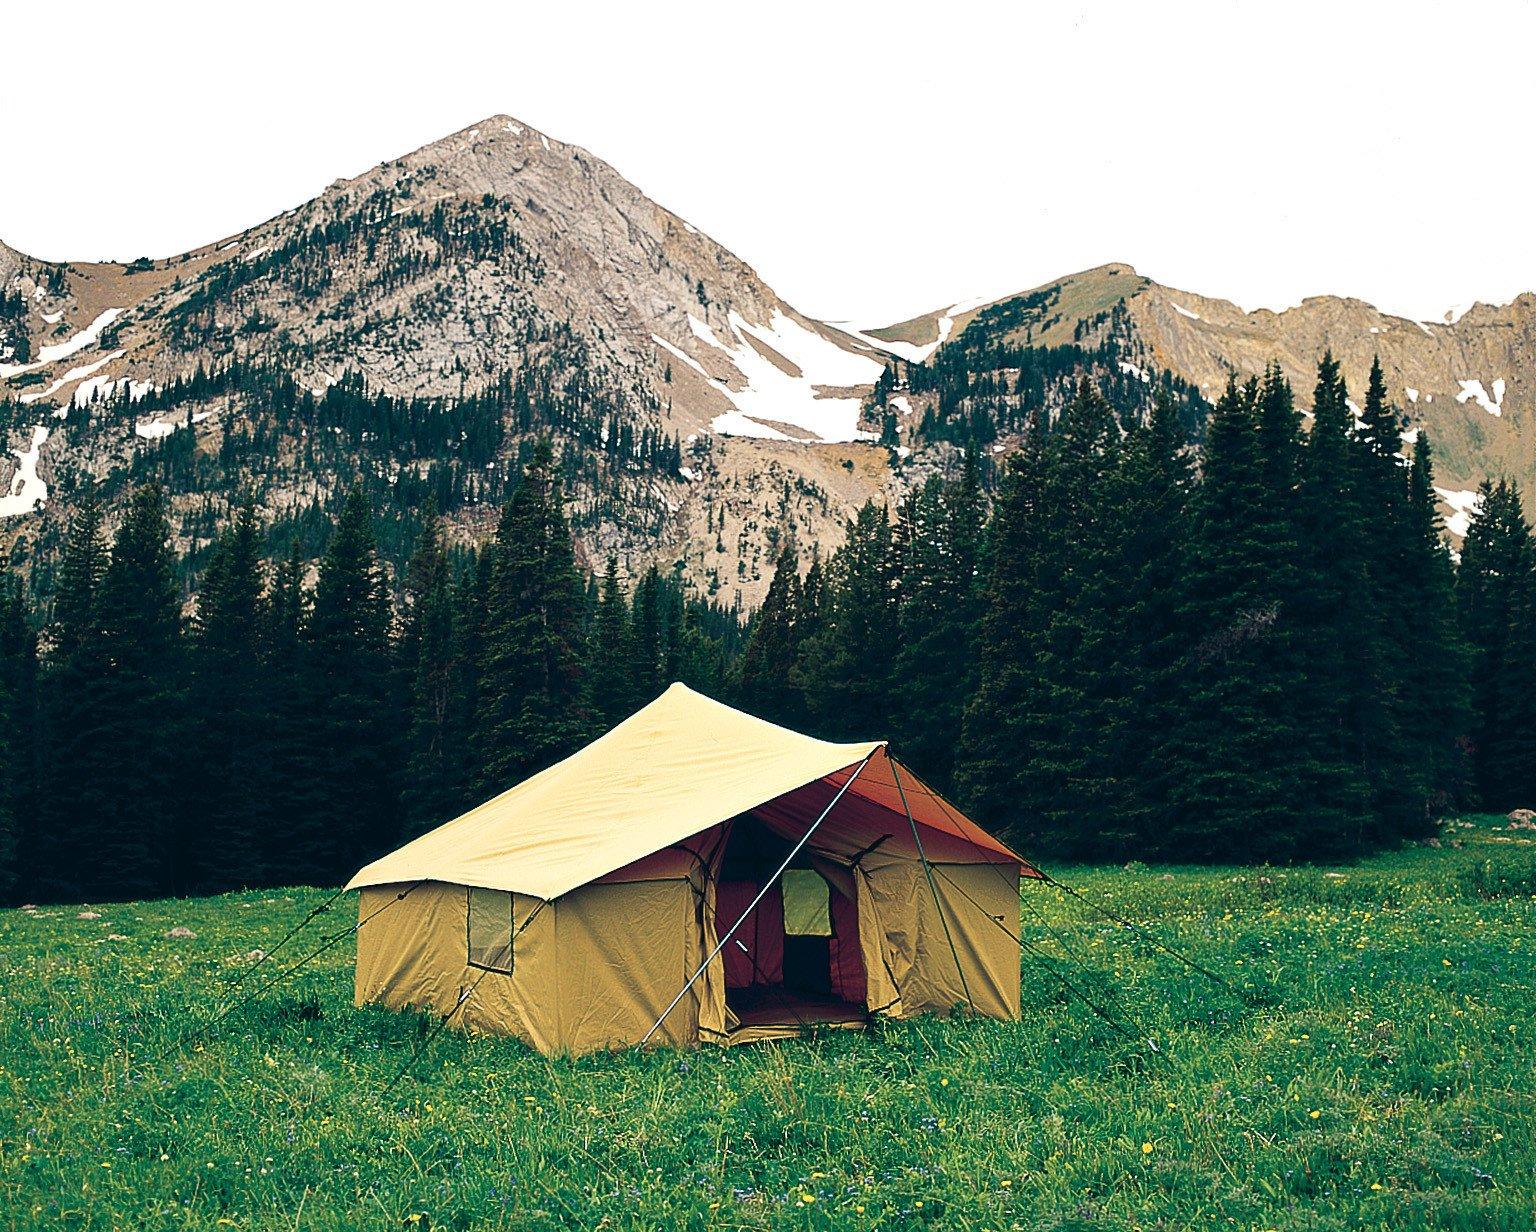 Spike Tents